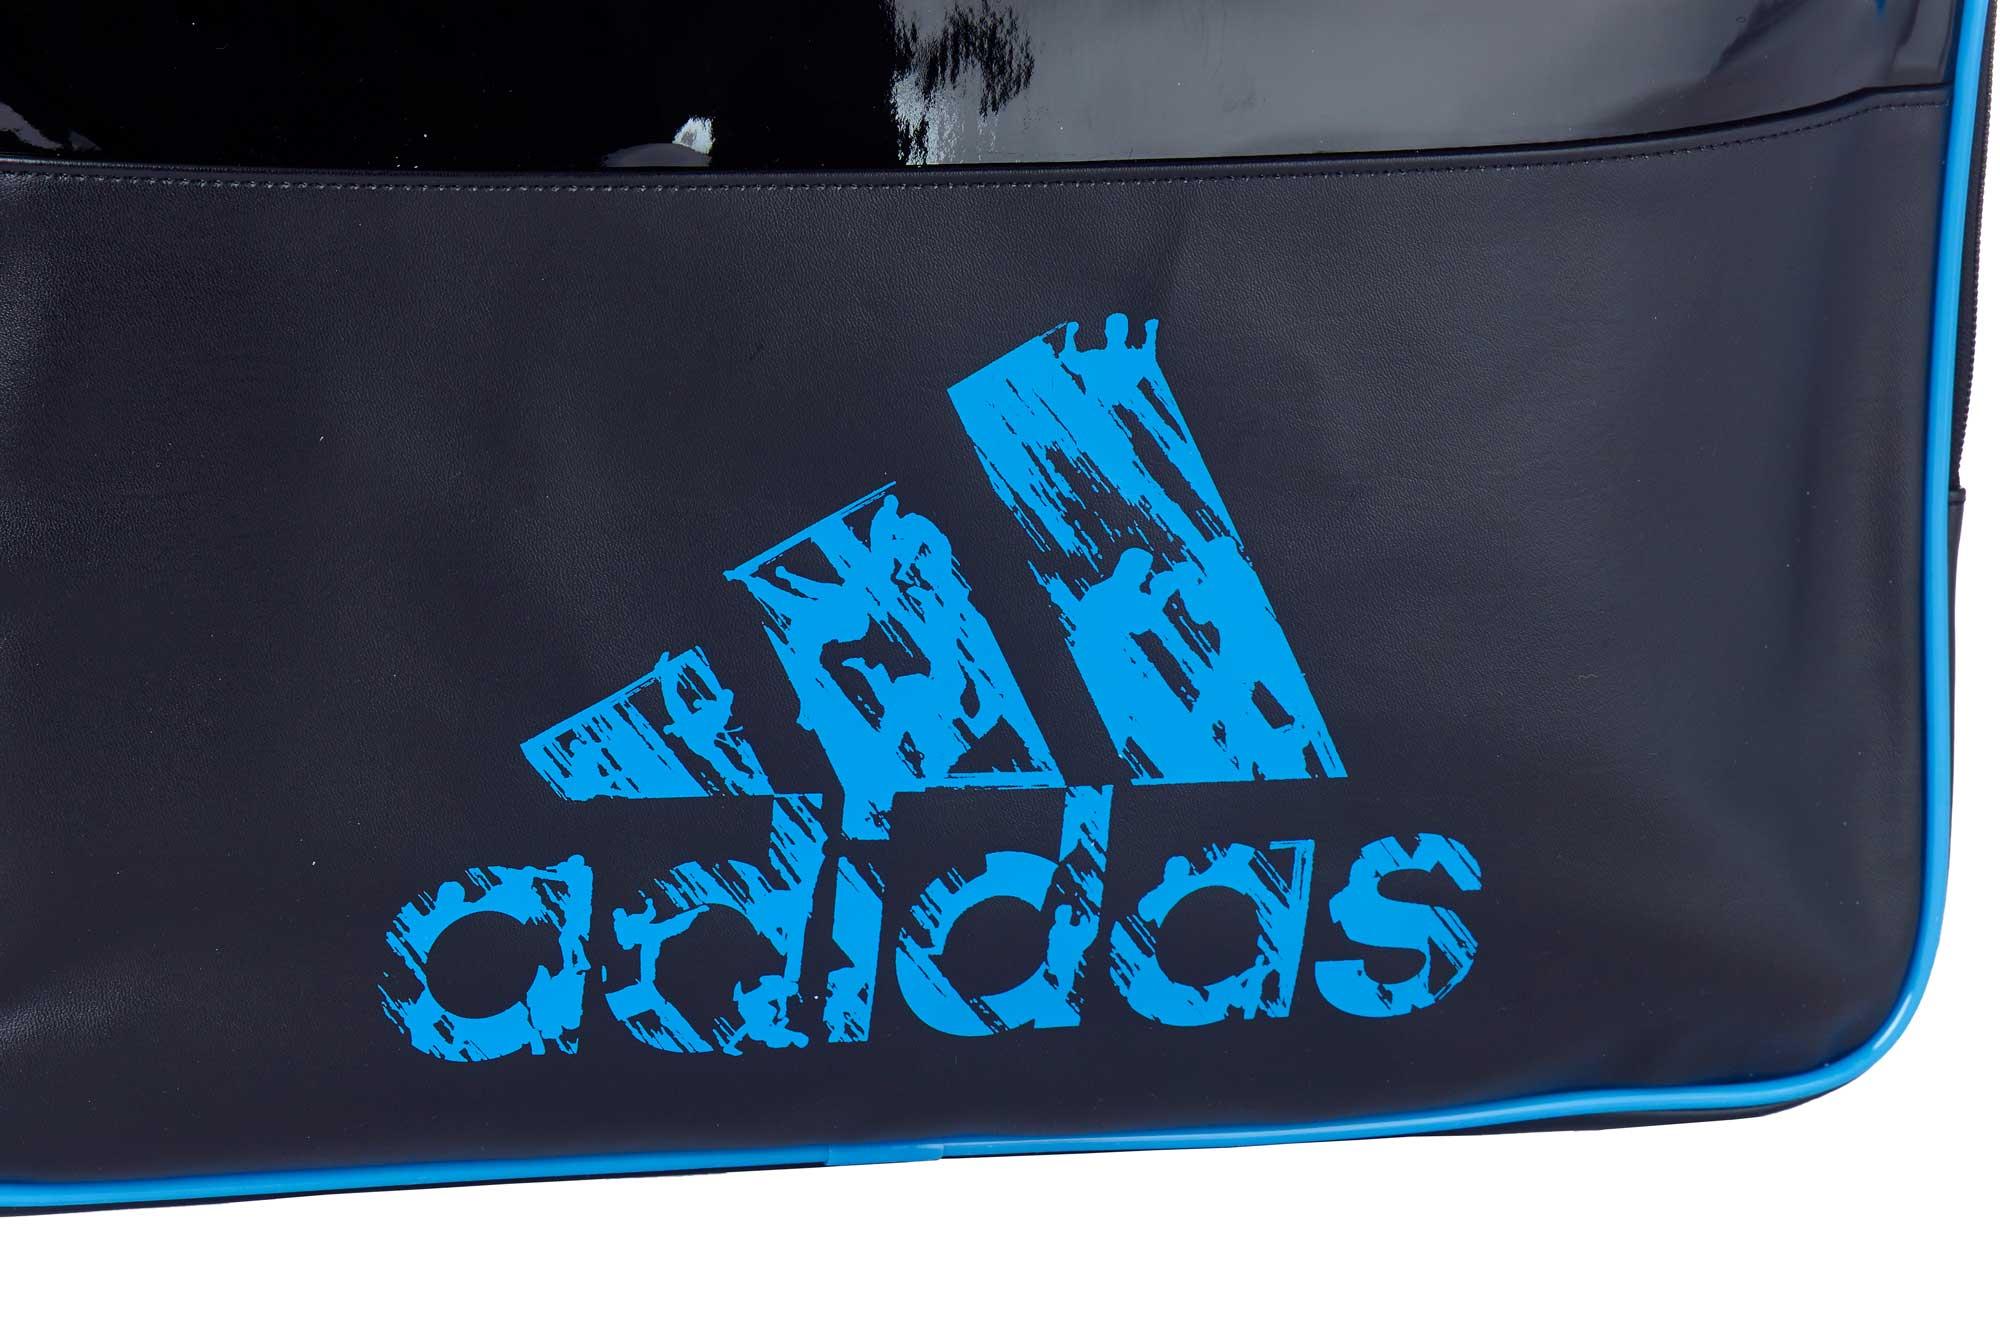 1e1461ba940c6 ... Vorschau  adidas Freizeit Tasche adiACC110CS3-L schwarz solar blue